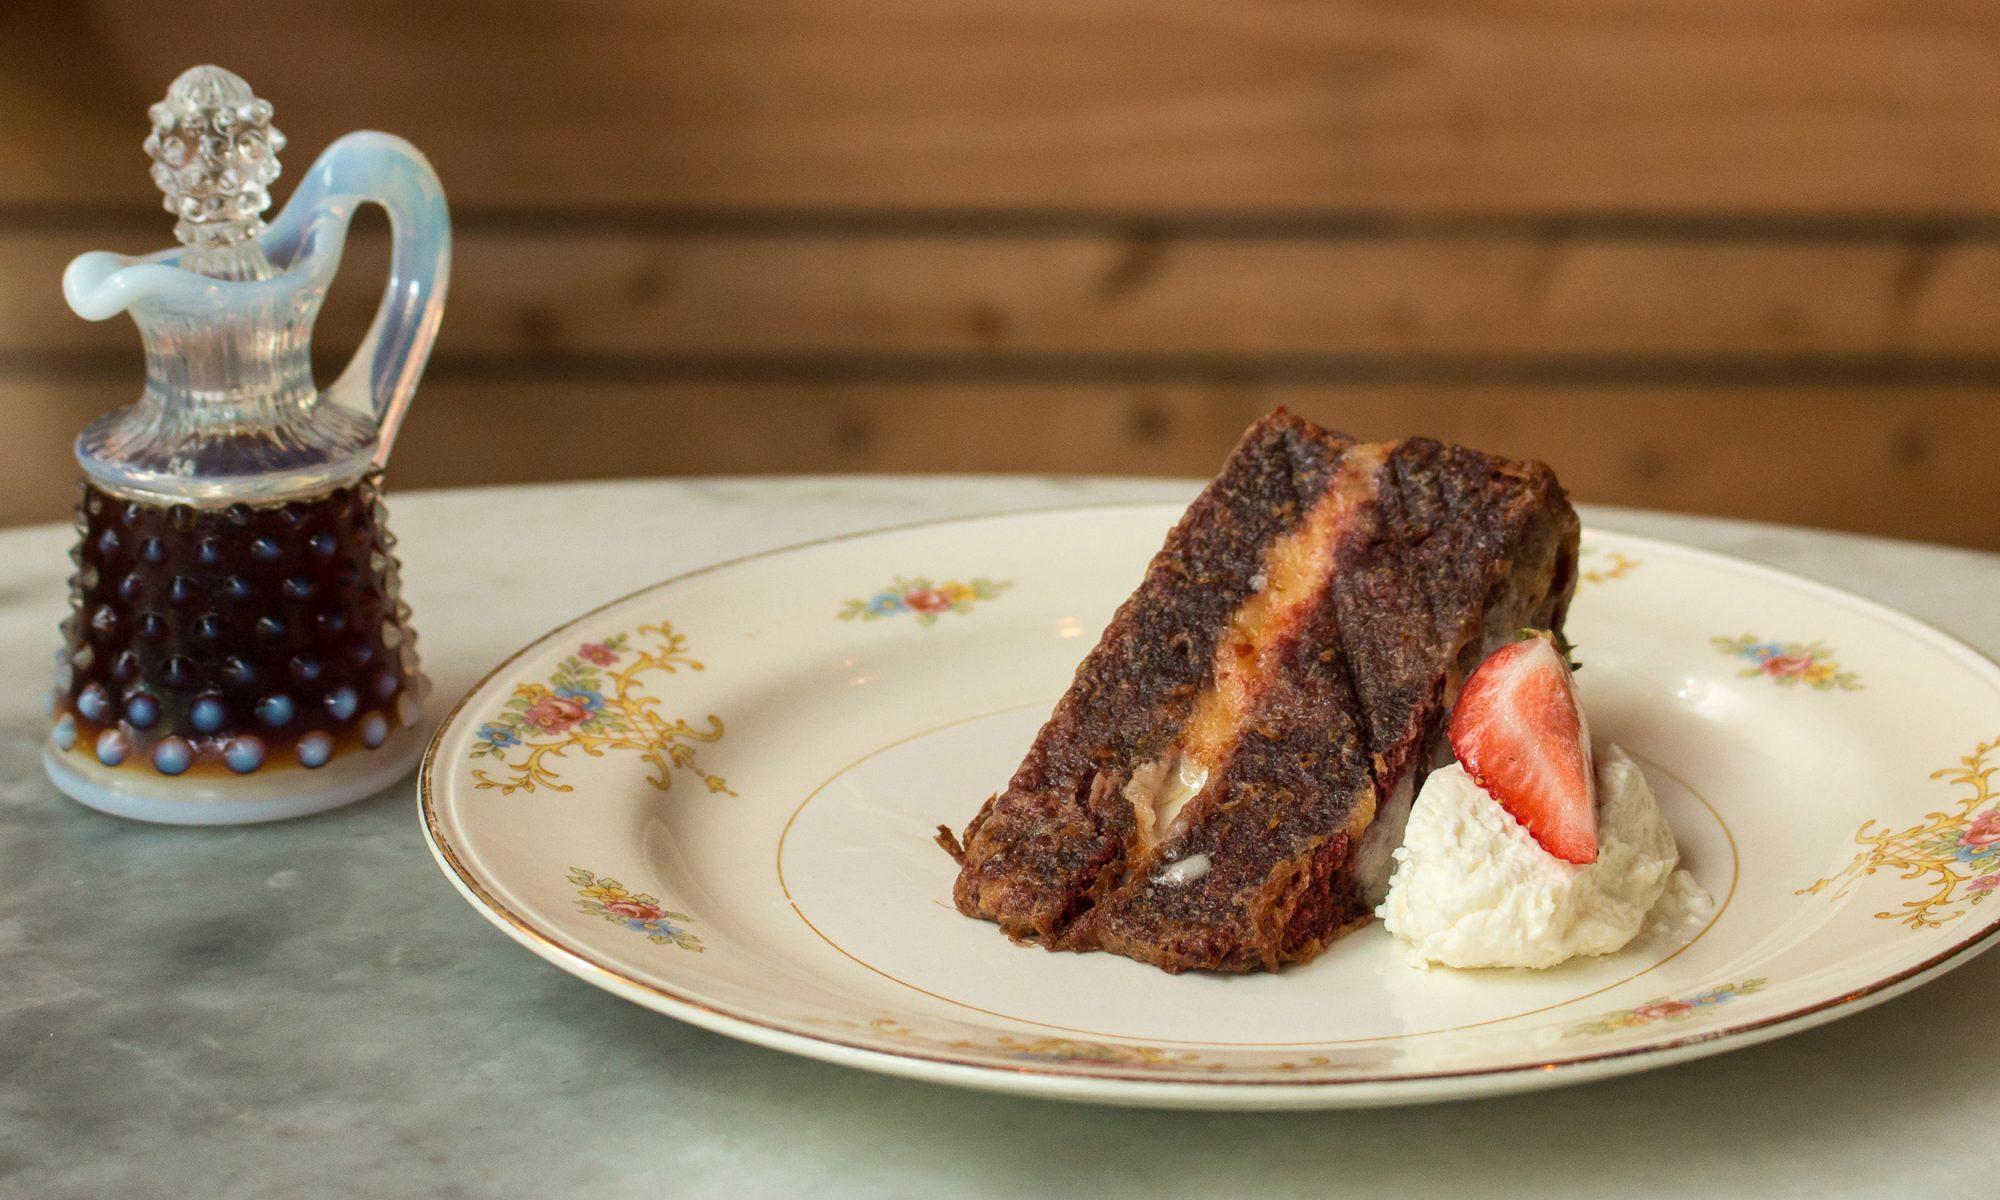 Eat Deep-Fried Cake for Breakfast